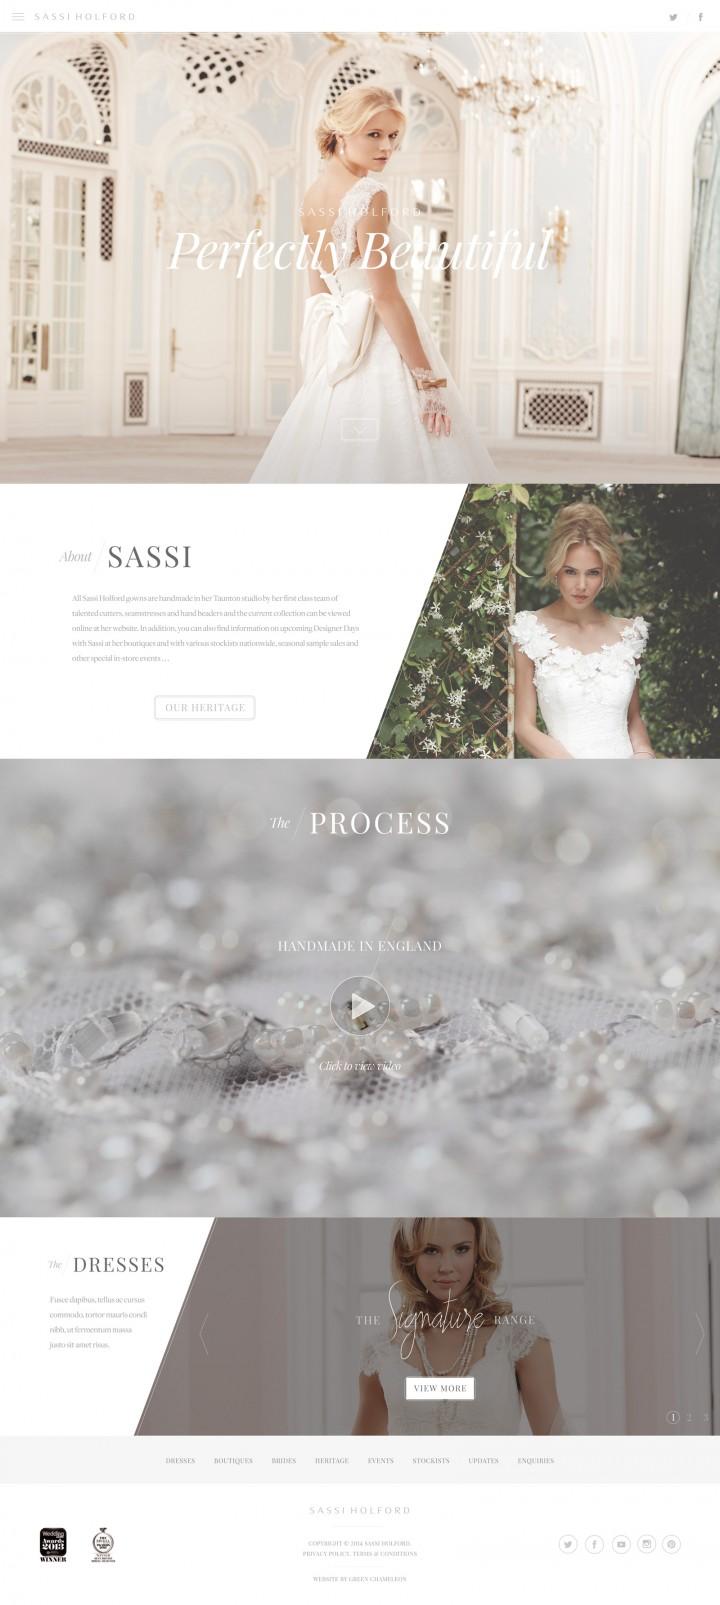 Sassi Holford Web Design Bristol